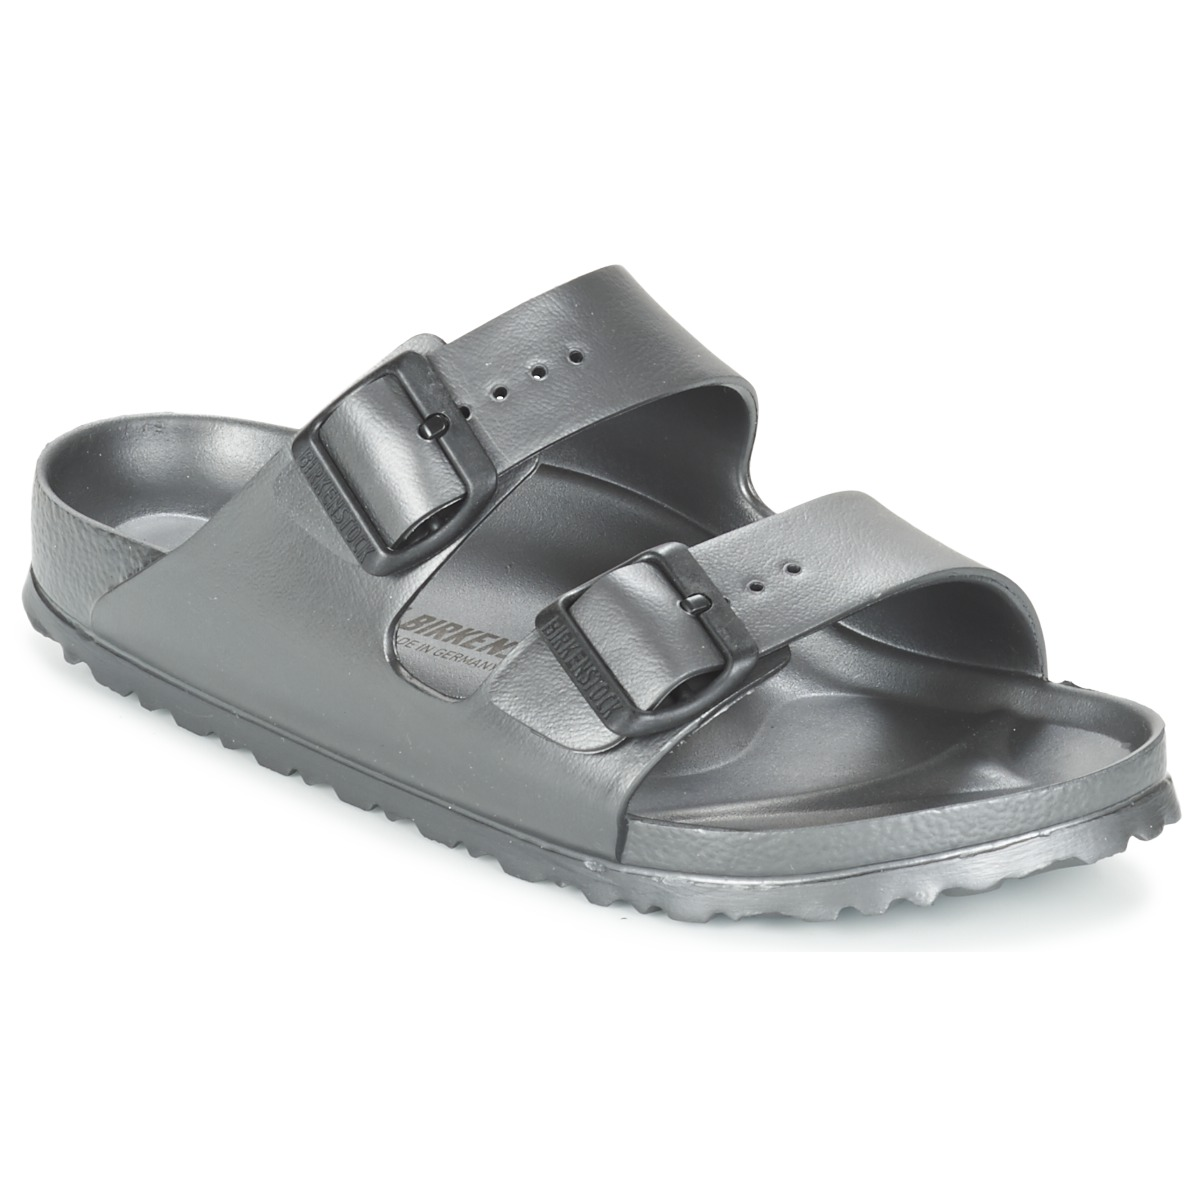 Birkenstock ARIZONA-EVA Grau - Kostenloser Versand bei Spartoode ! - Schuhe Pantoffel Damen 31,99 €